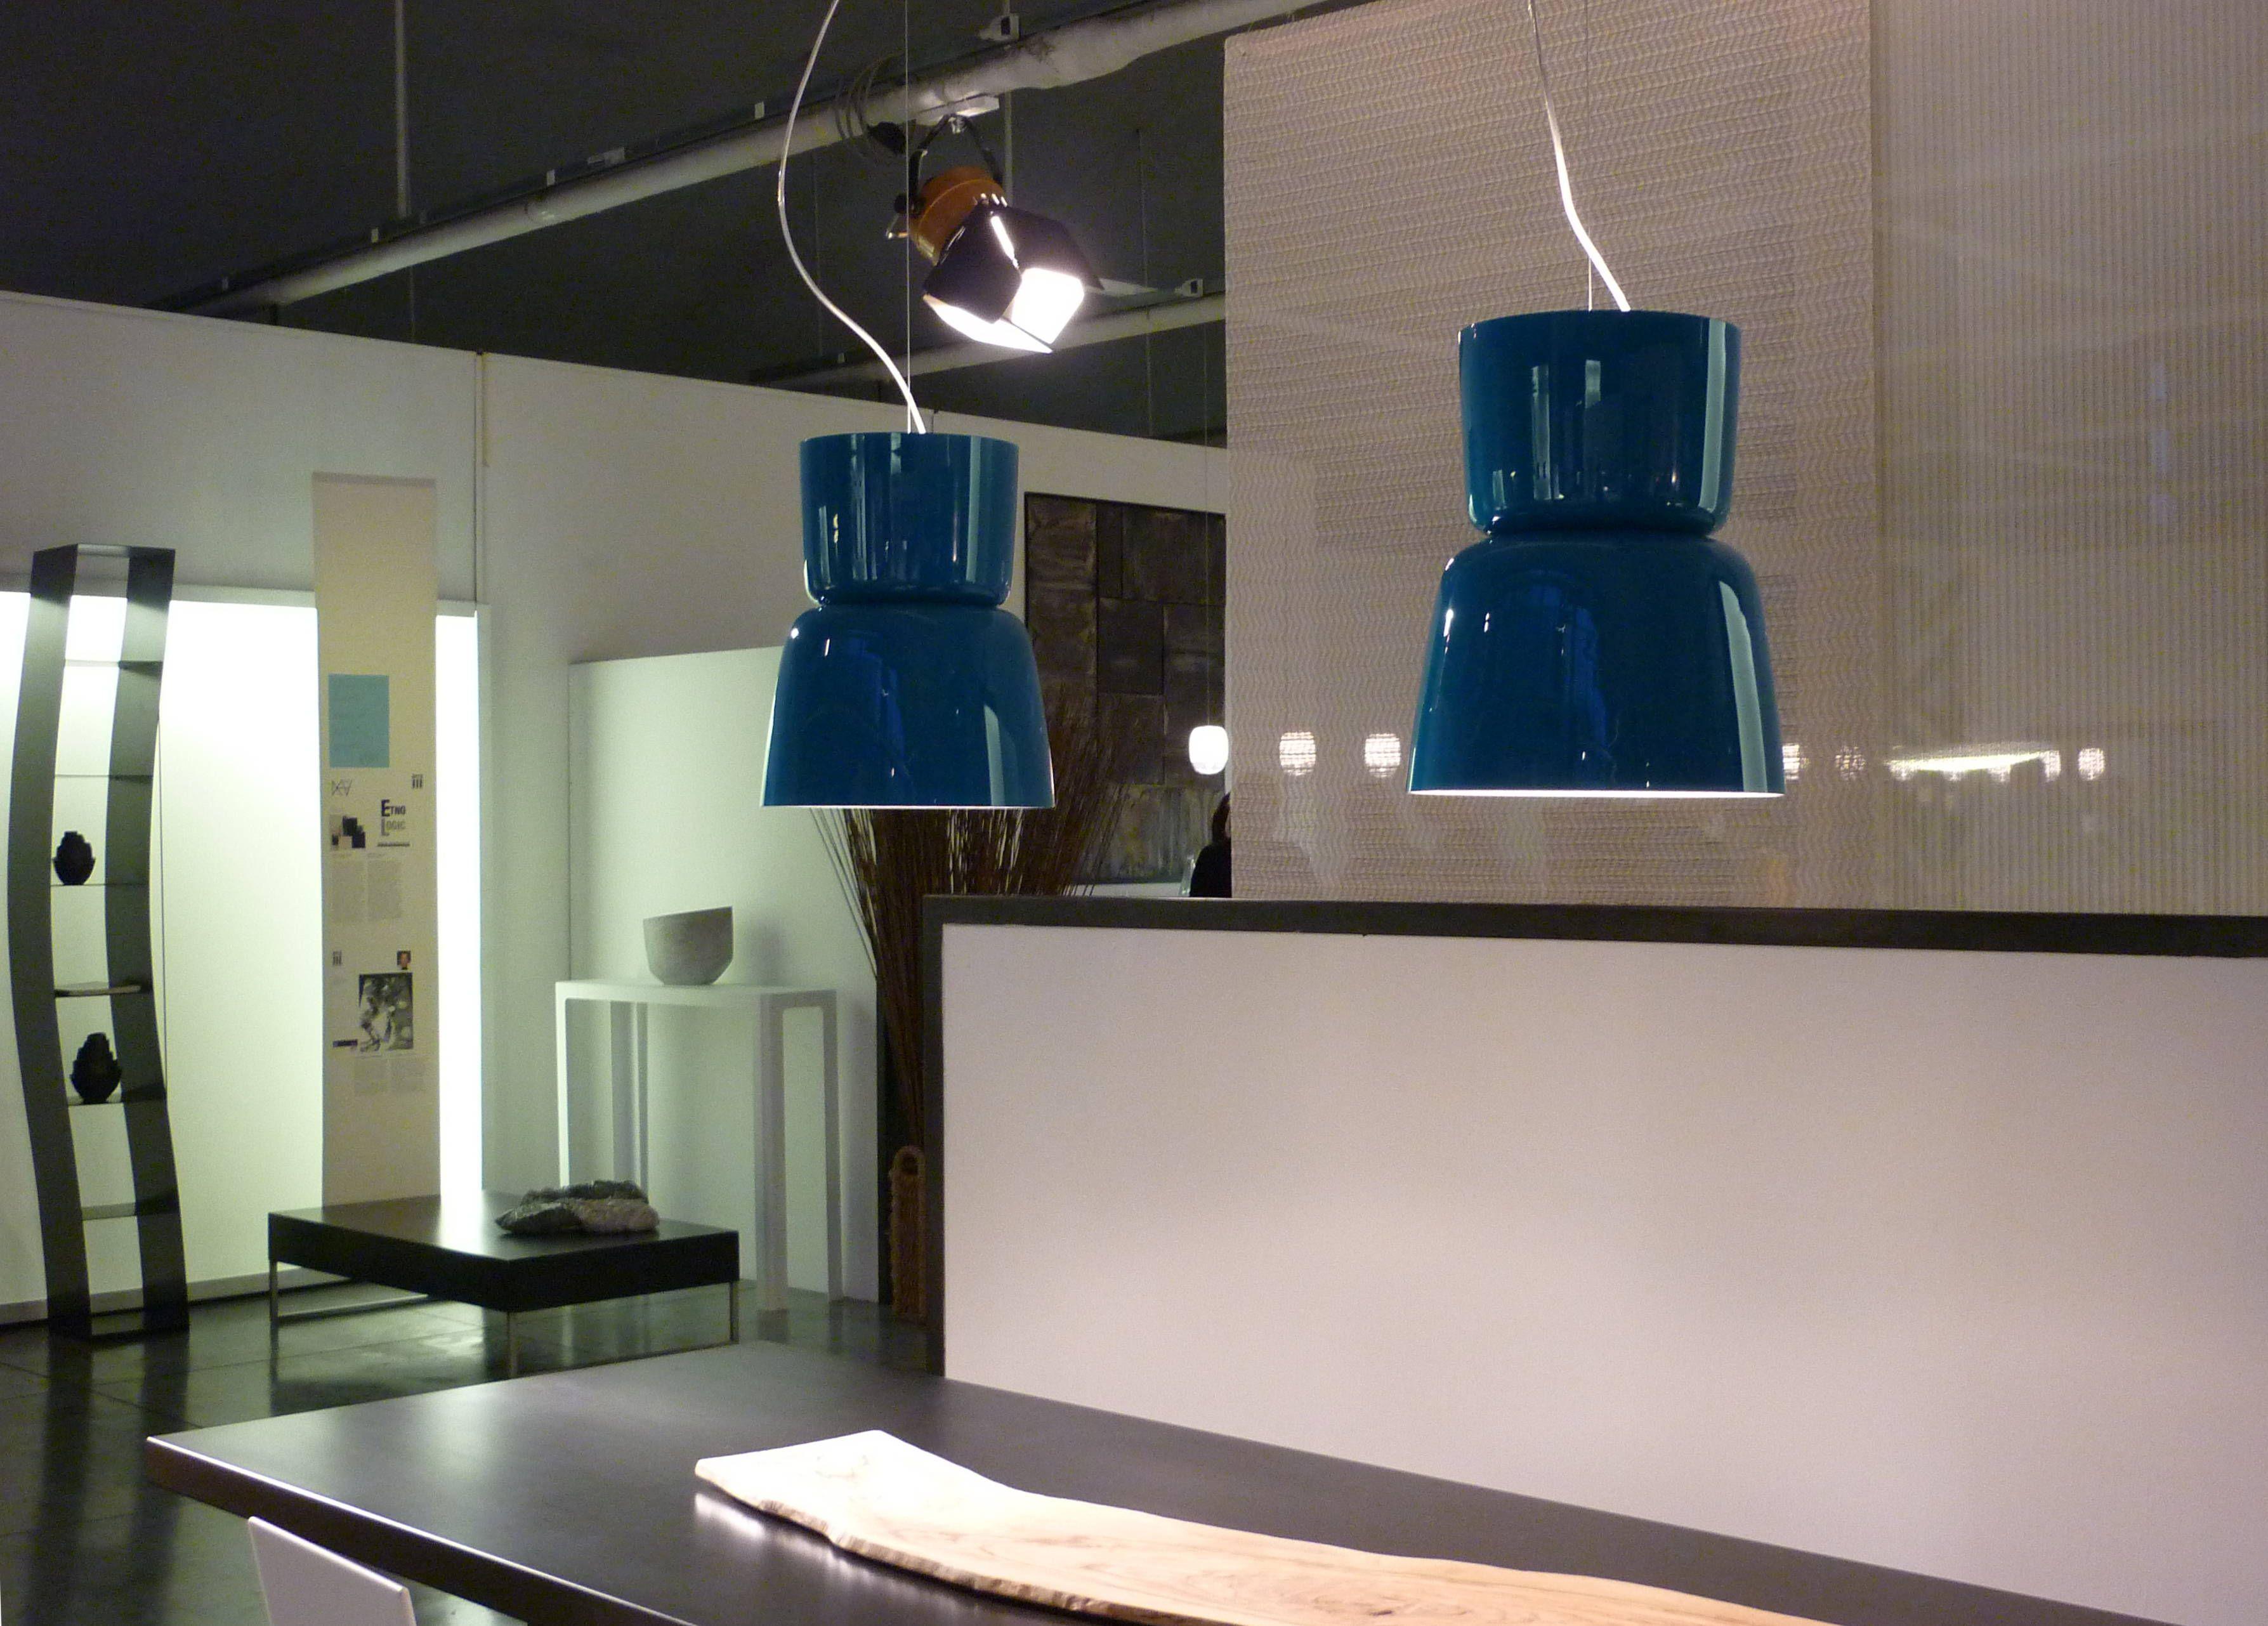 Prandina Mobili ~ Gongsmall a new suspension lamp in the #gong family! #prandina